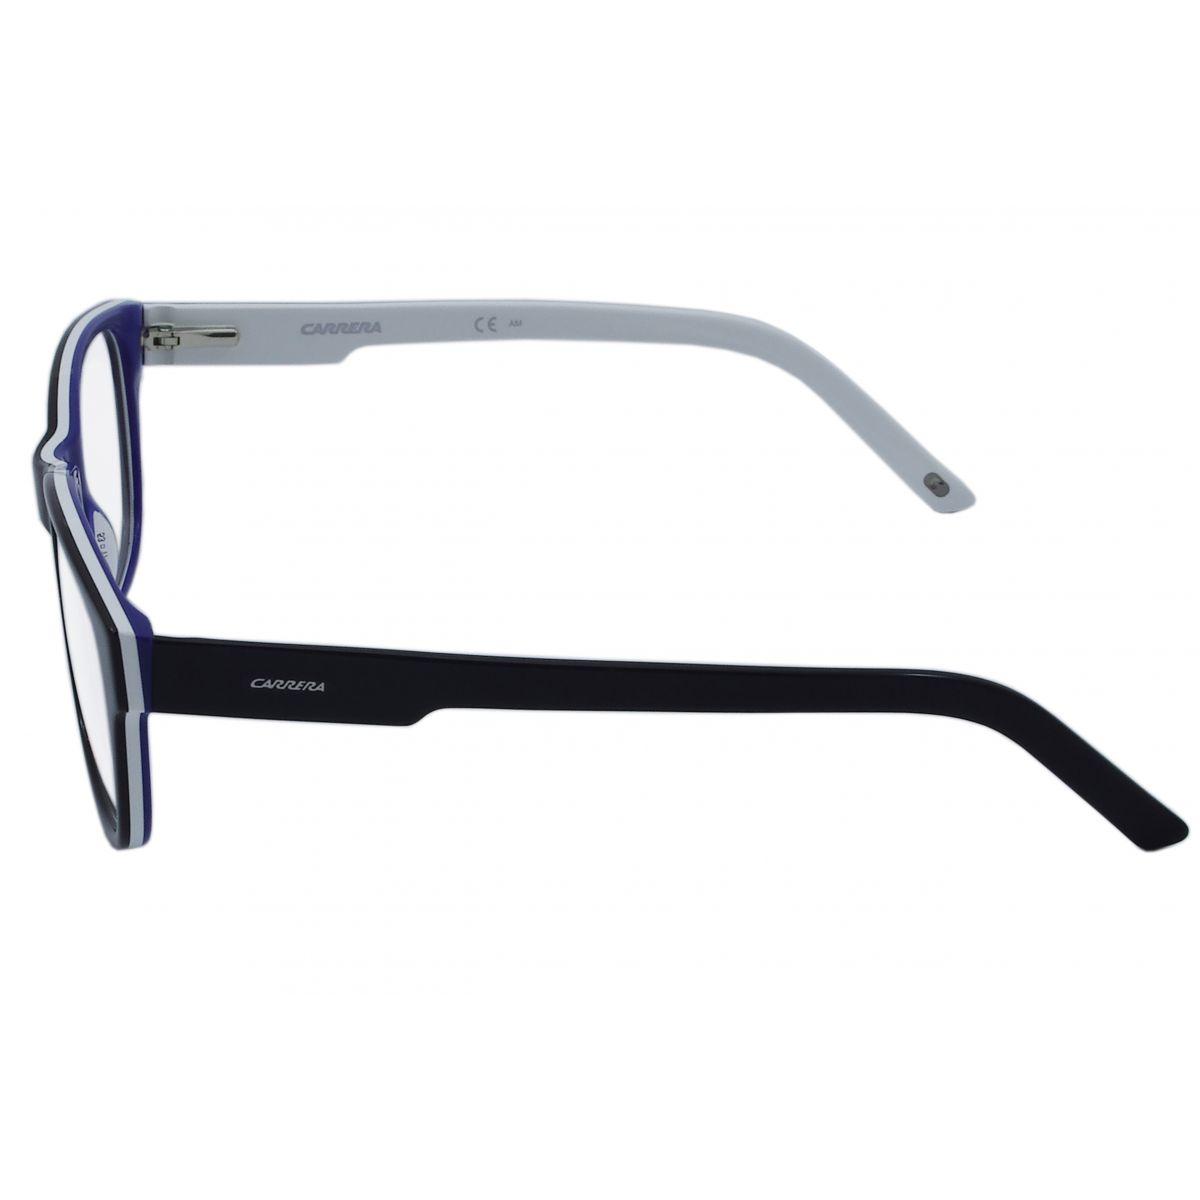 adf7c00ca Melhores Marcas De Oculos Masculinos | United Nations System Chief ...